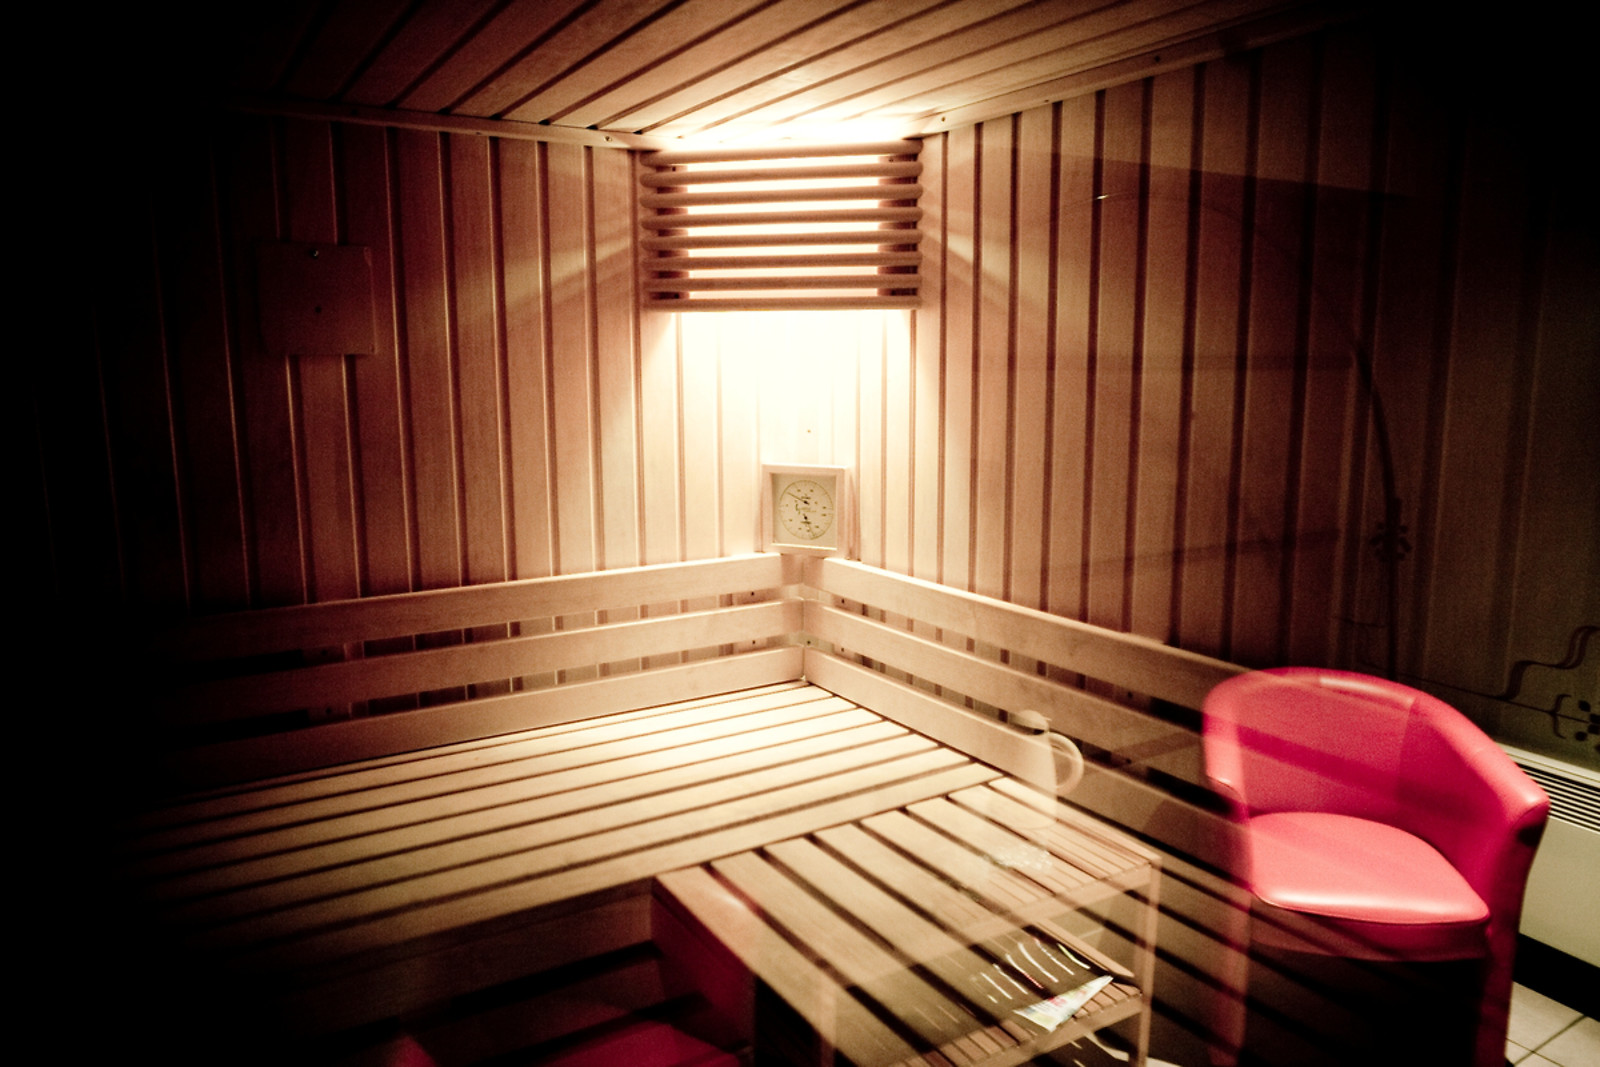 s ance de hammam au vichy vasion spa du central h tel vichy 03 wonderbox. Black Bedroom Furniture Sets. Home Design Ideas